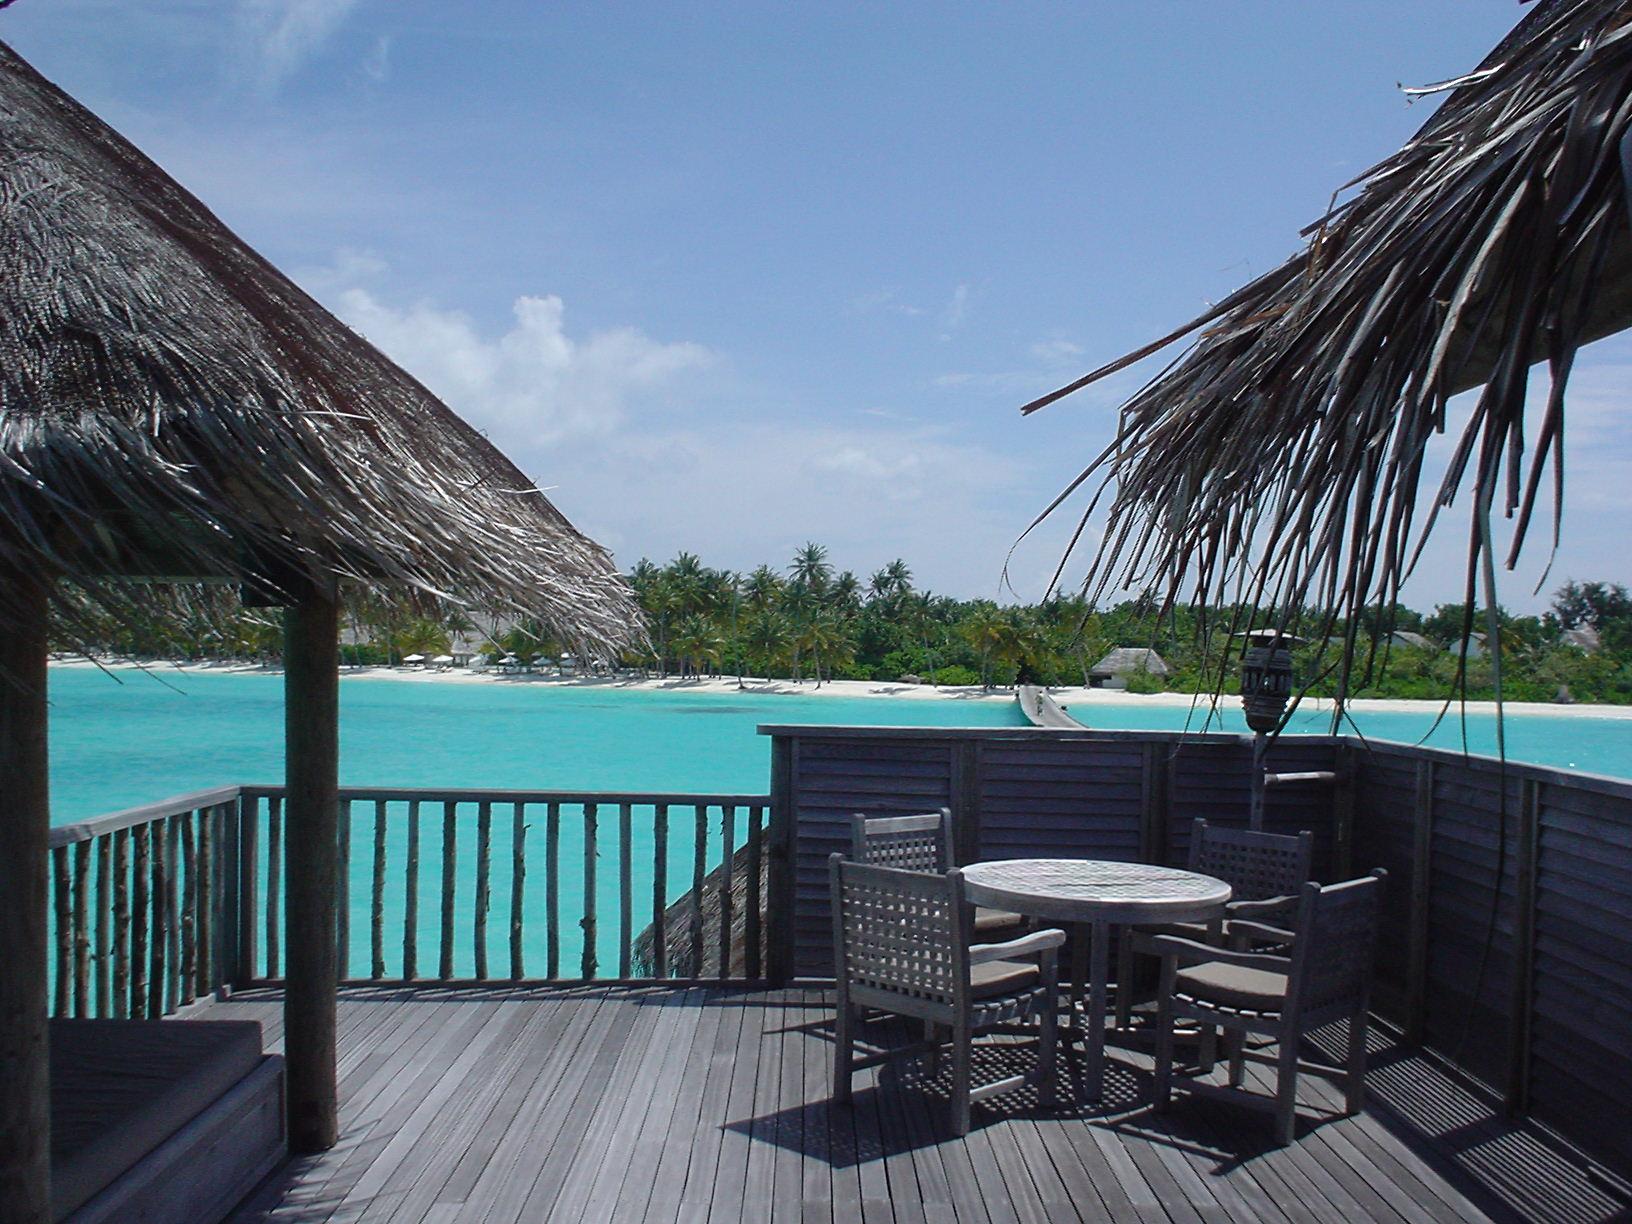 Hotel Soneva Gili, Maldivas - vista desde la terraza de lavilla